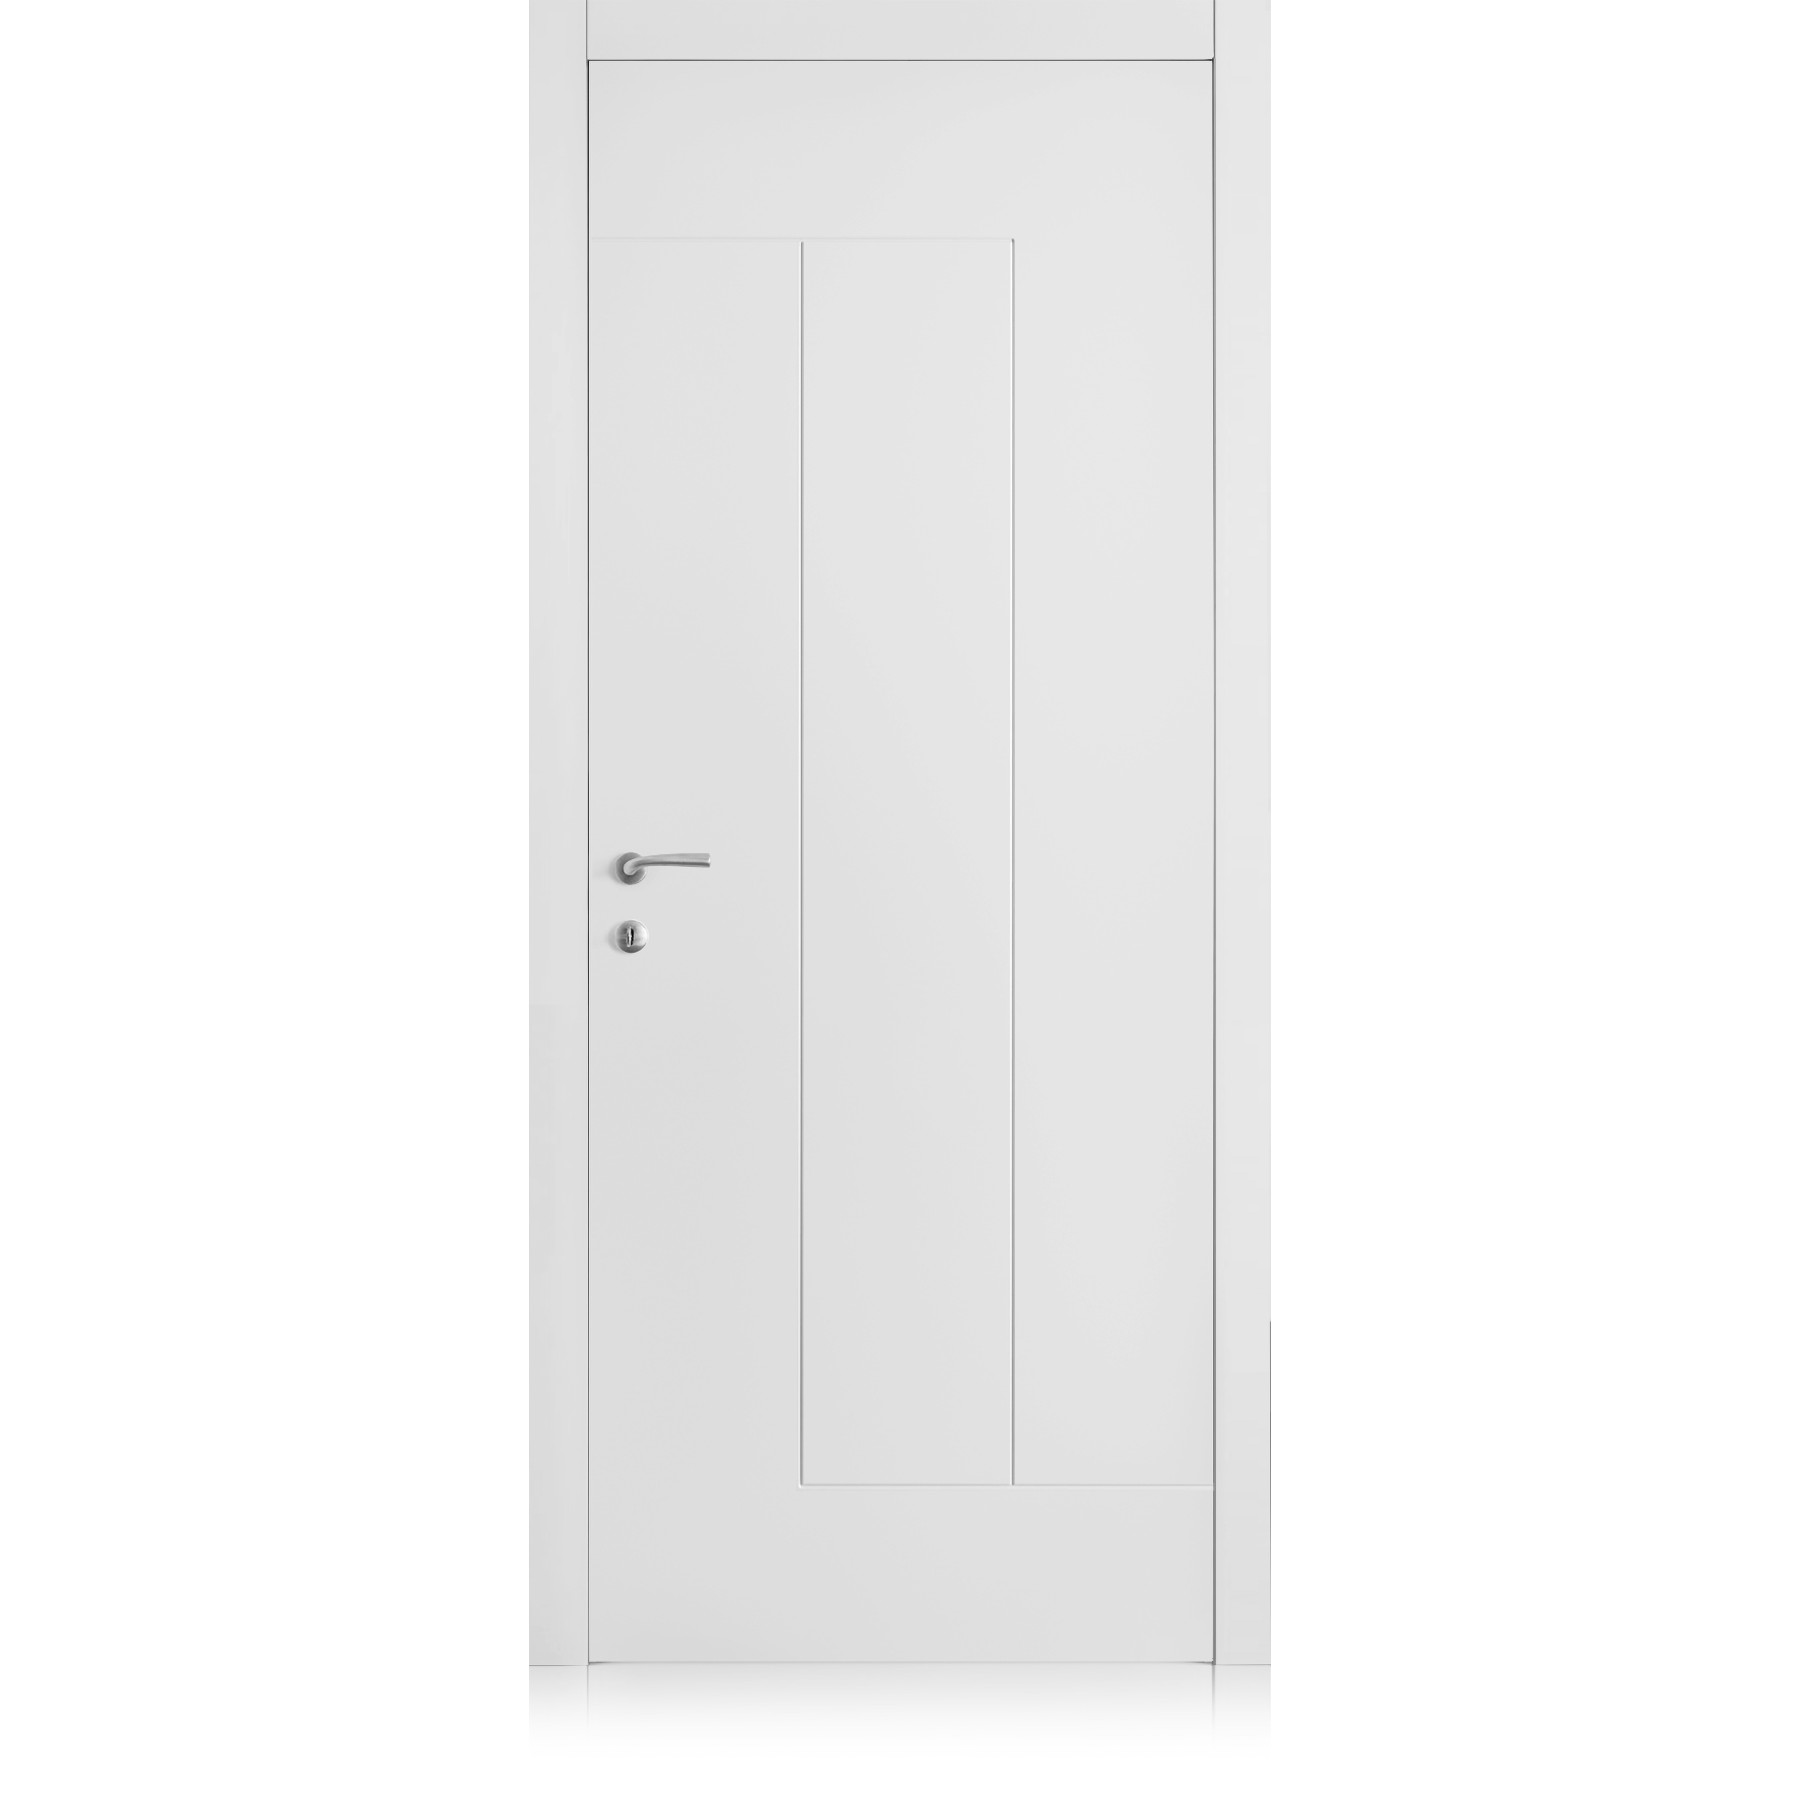 Yncisa / 8 bianco optical door